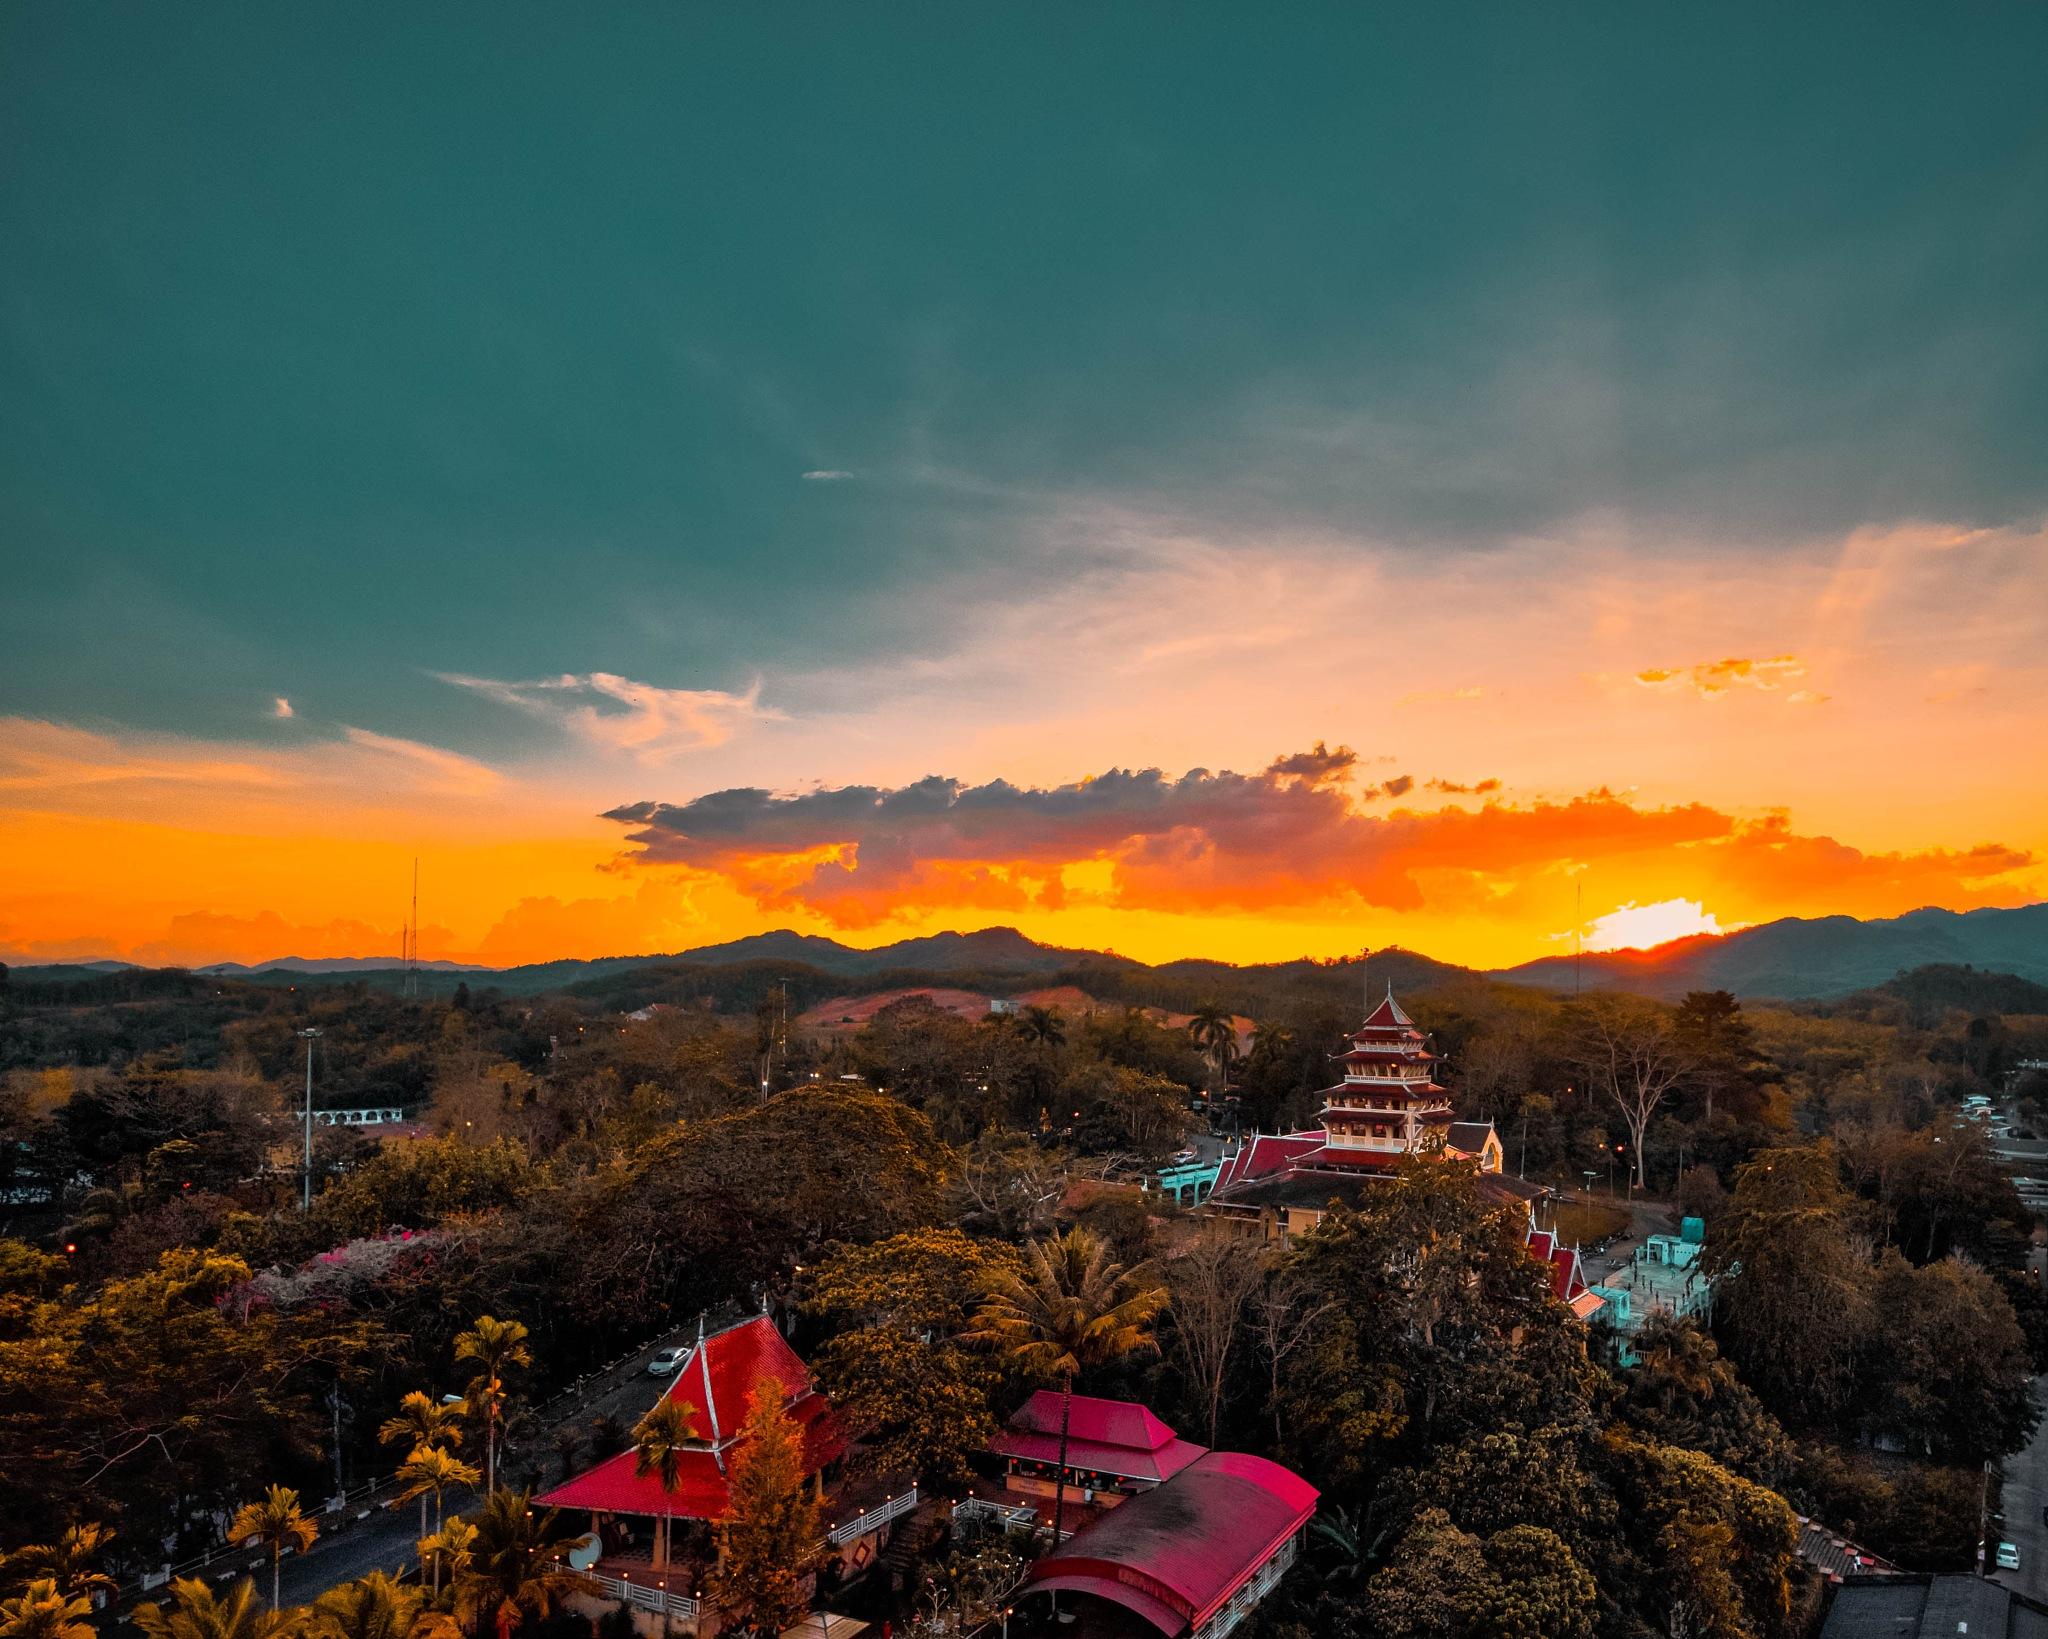 Sunset, Betong, Thailand by Kelvin ZyTeng